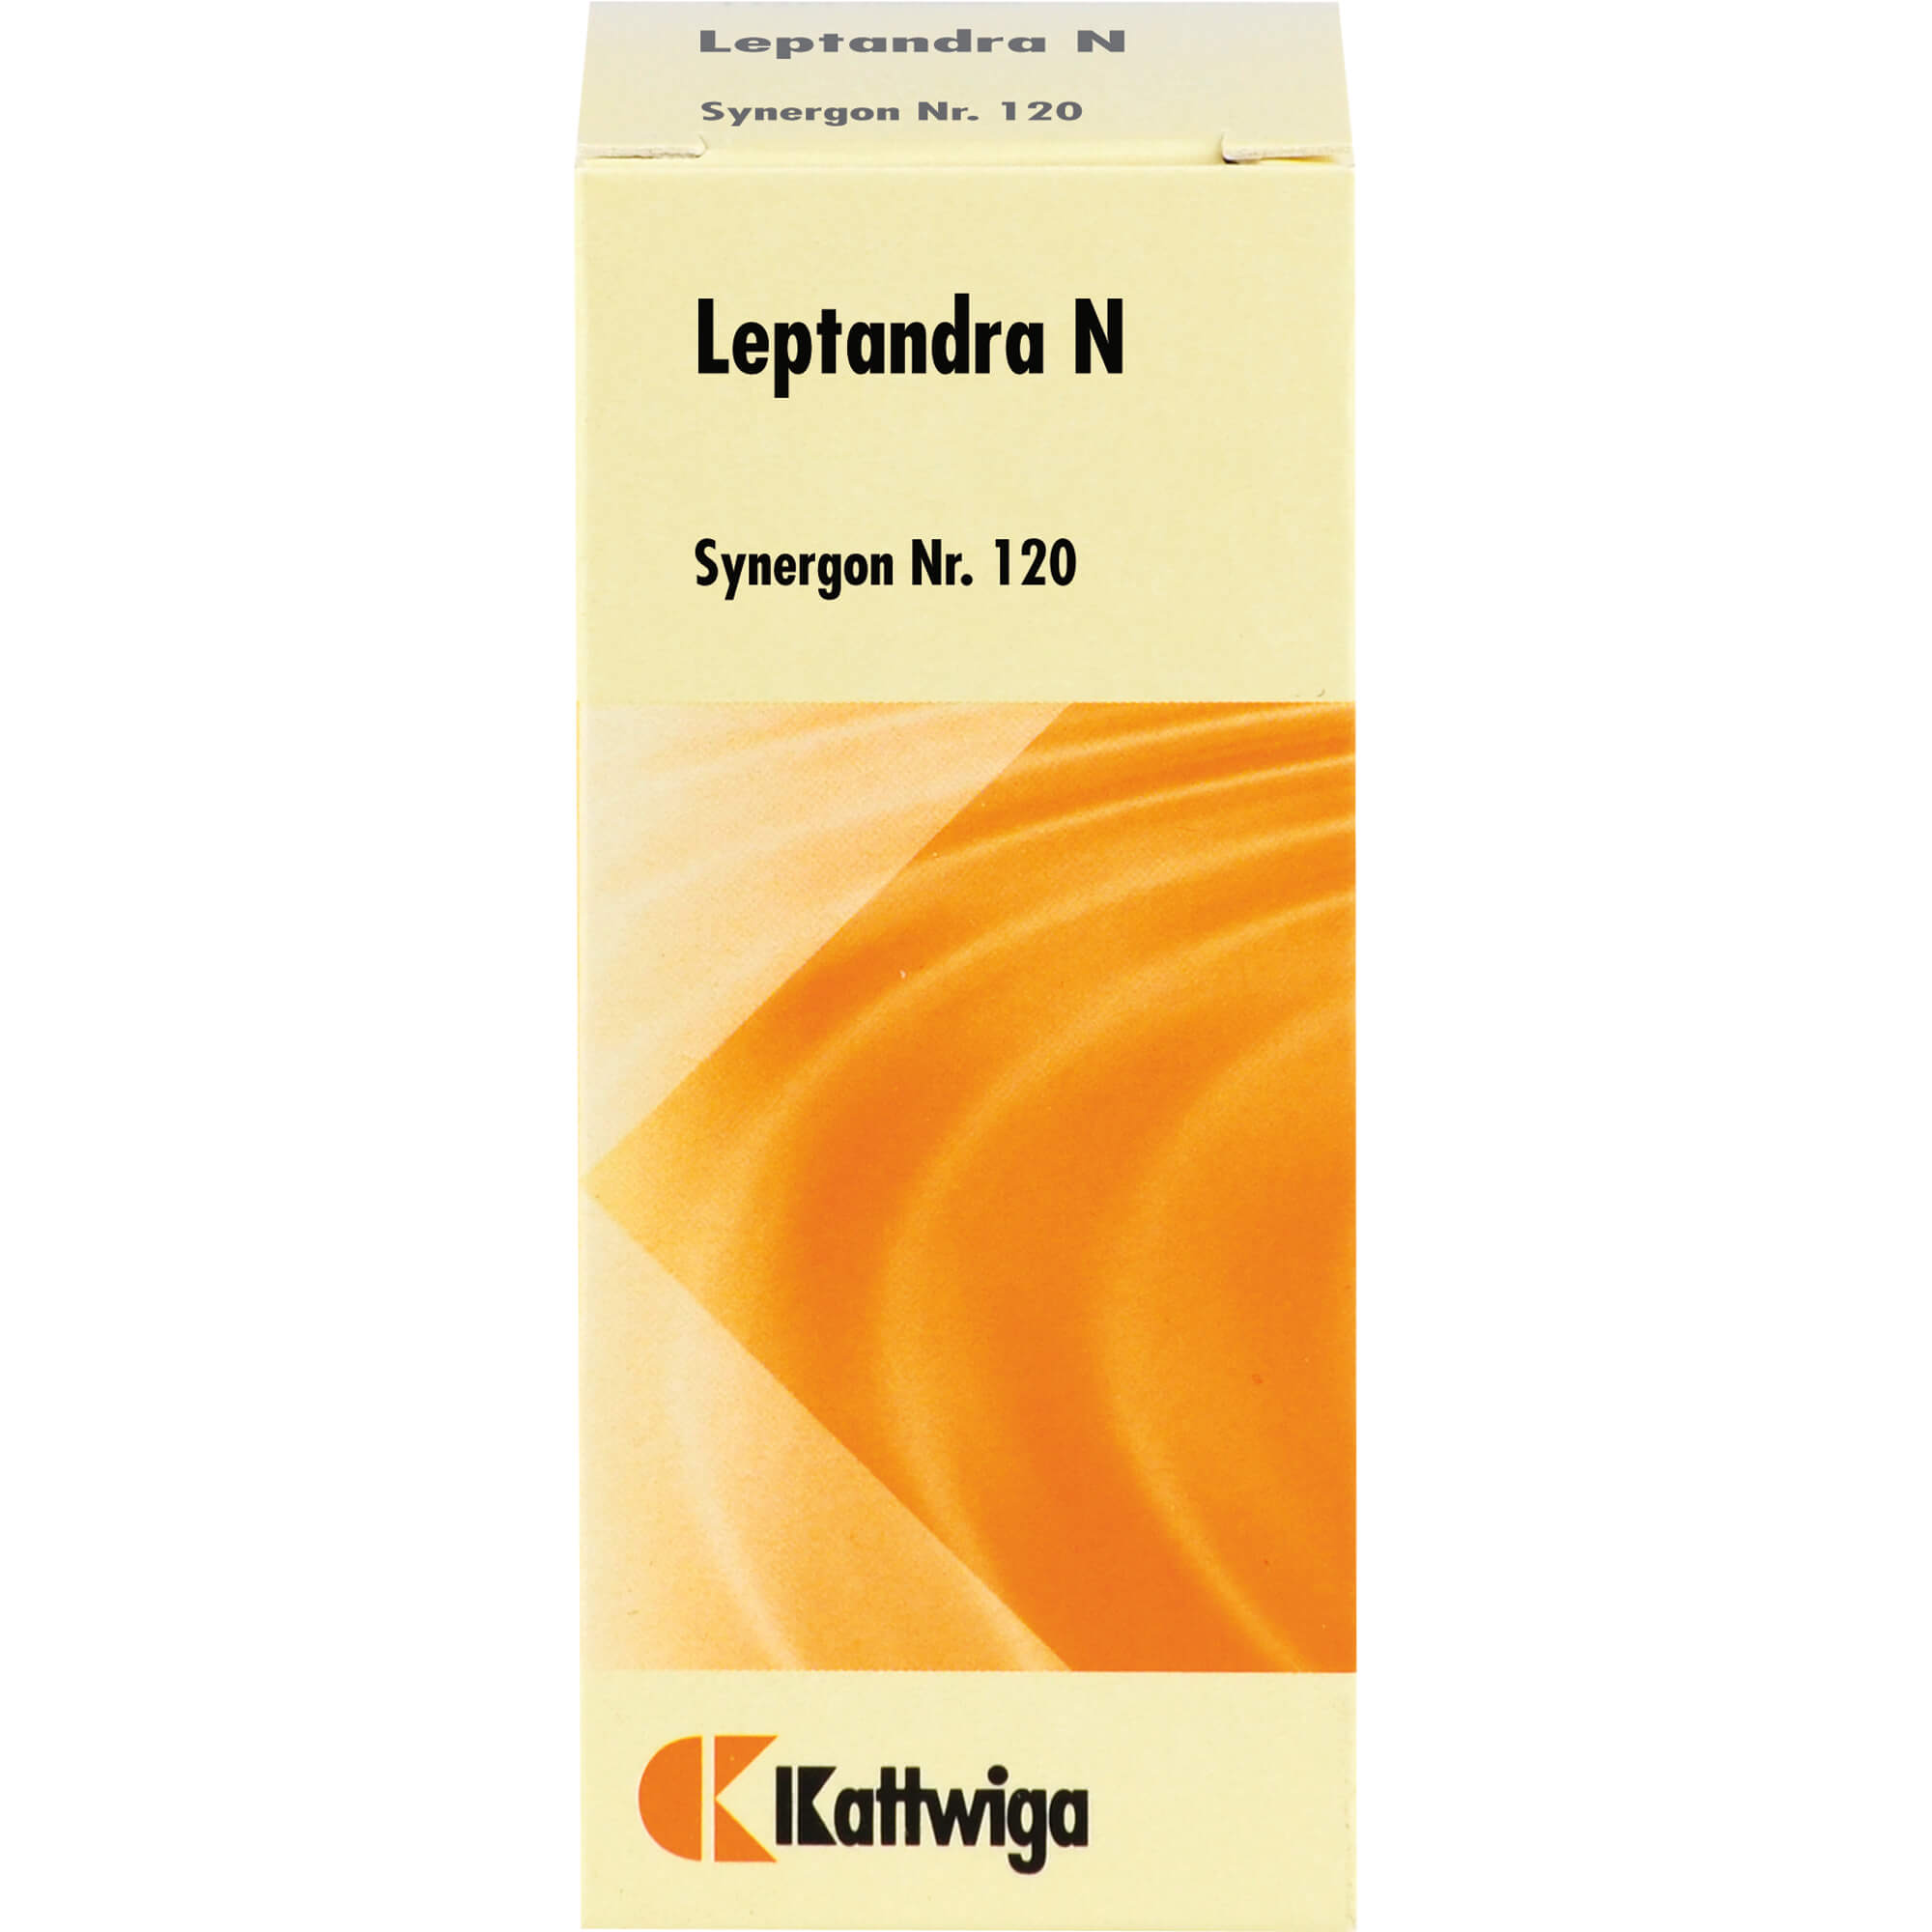 SYNERGON KOMPLEX 120 Leptandra N Tabletten